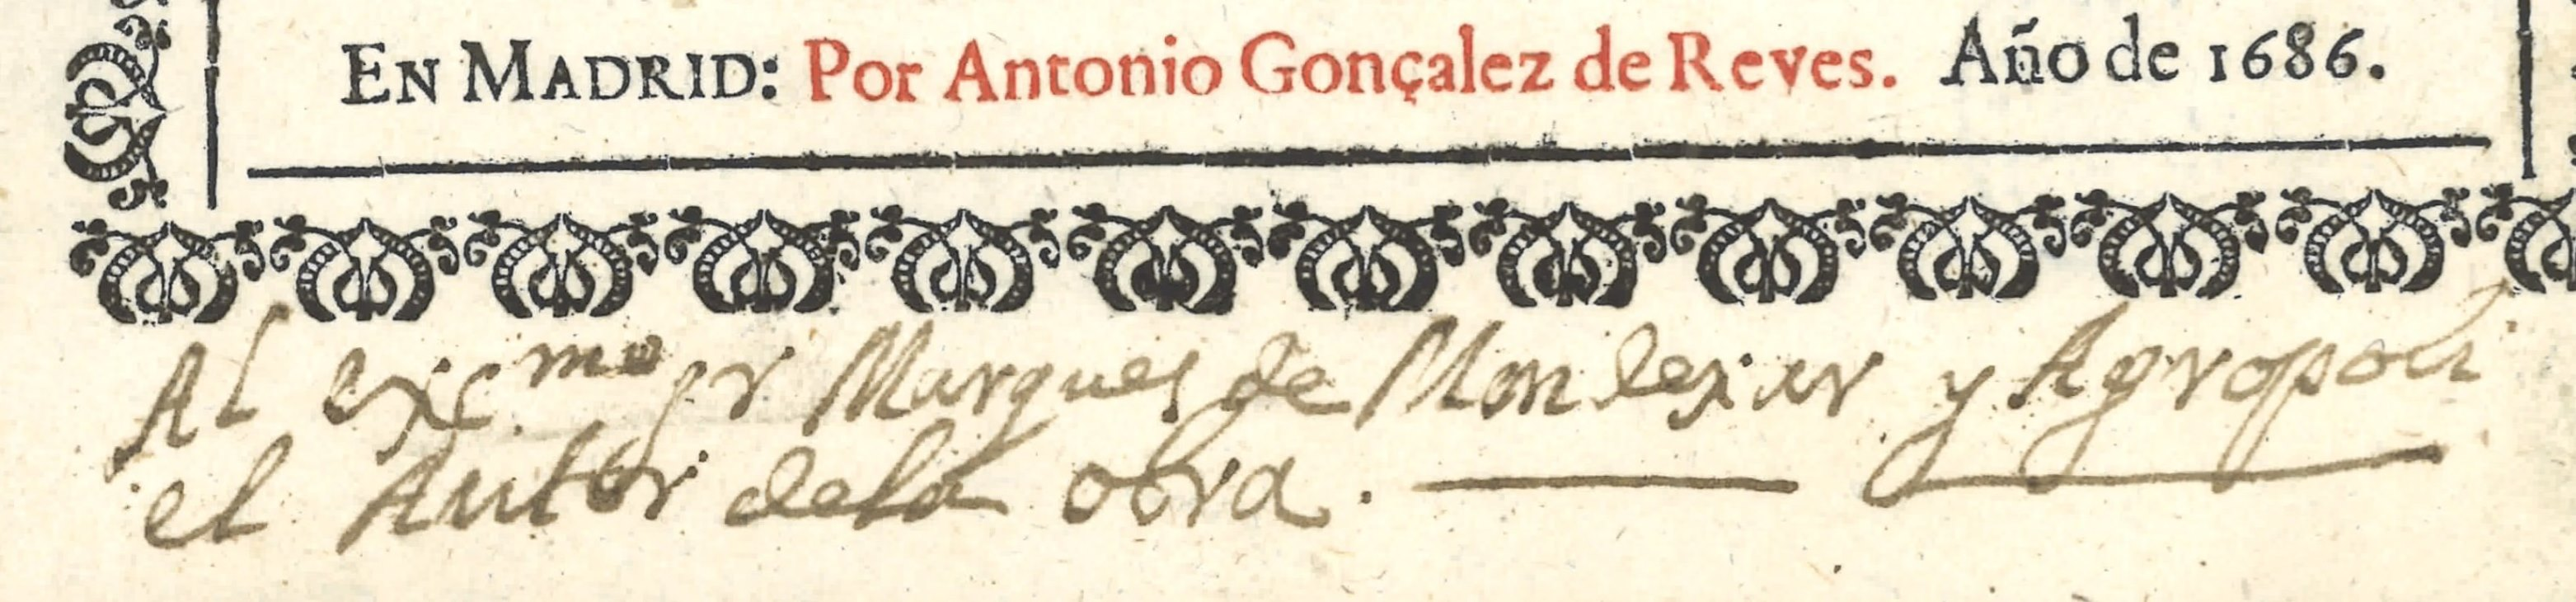 "Dedicatoria del autor, Fray Rafael de San Juan, al Marqués de Mondéjar: ""Al Excmo. Sr. Marqués de Mondejar y Agropoli, el autor de la obra"""